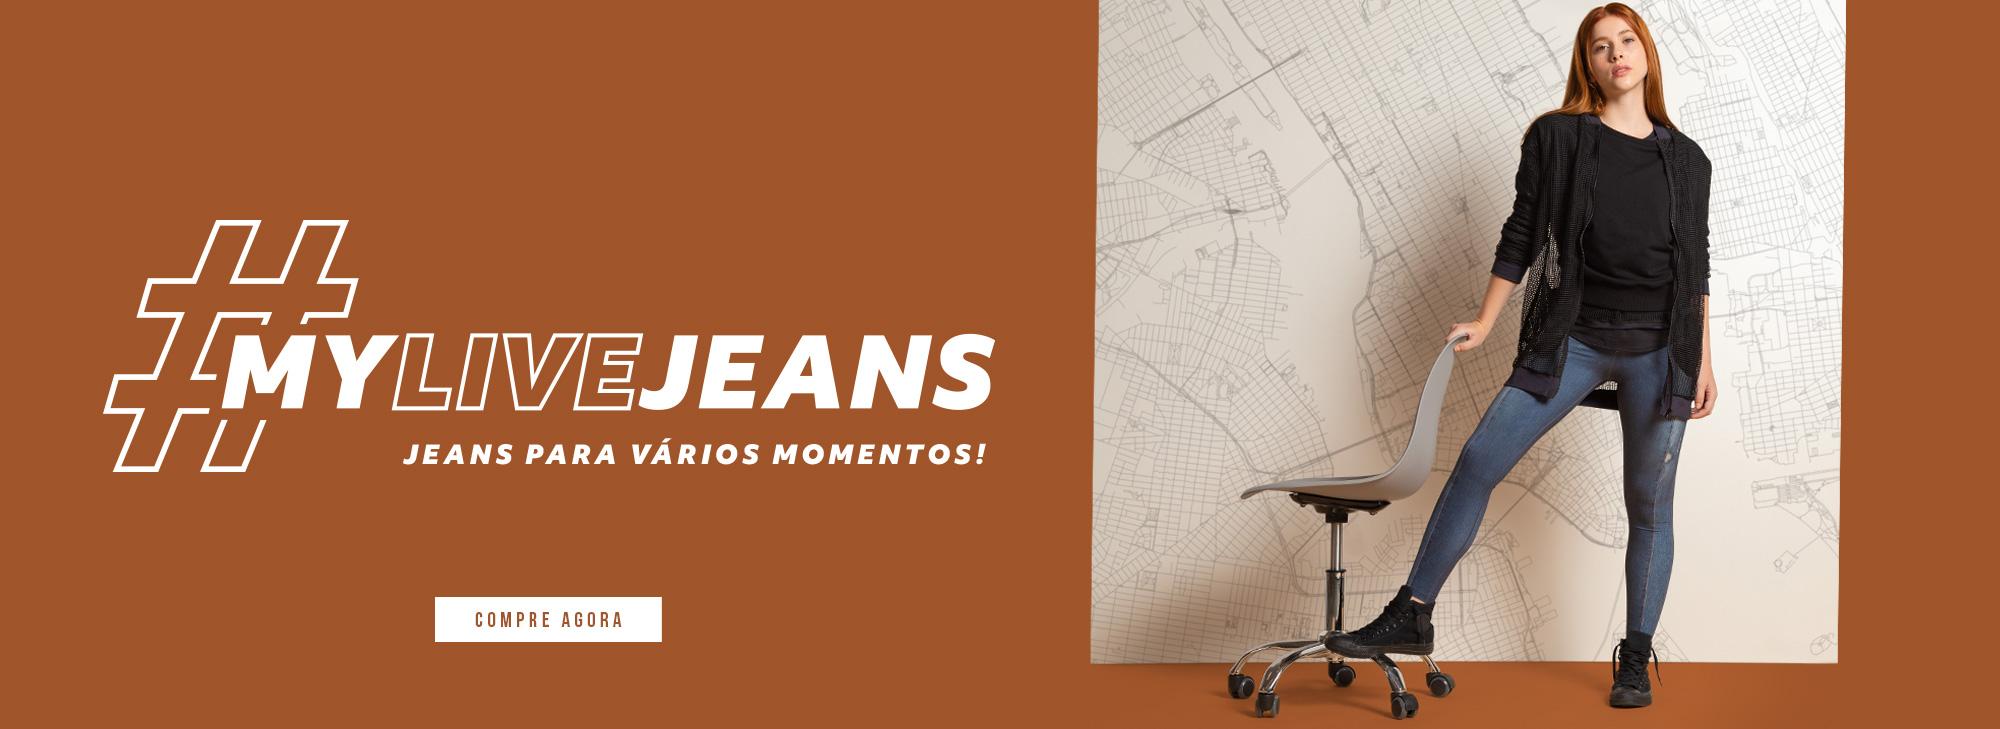 banner_D_jeans